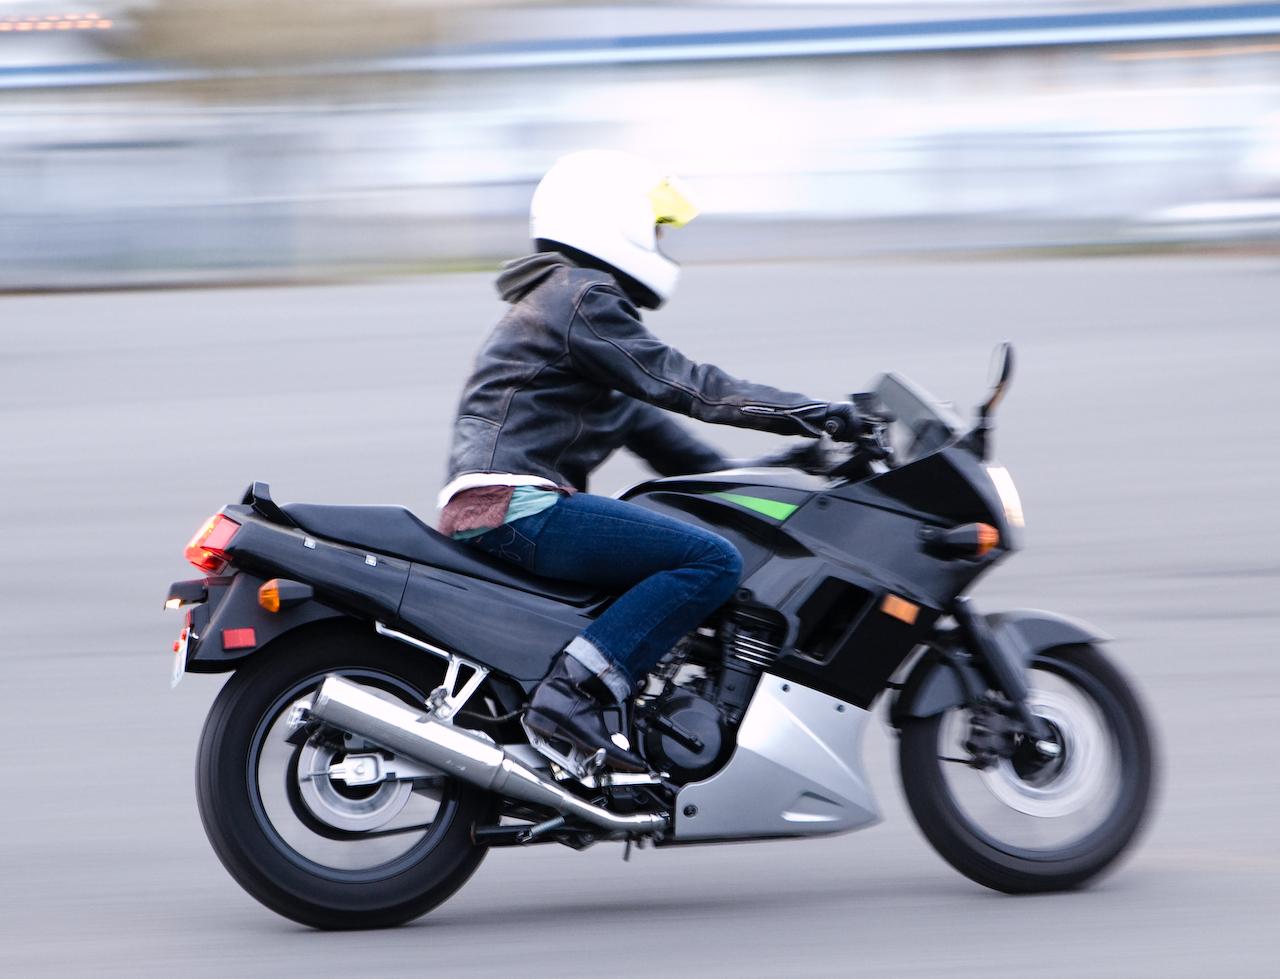 Suzuki Sports Bike Price In Nepal